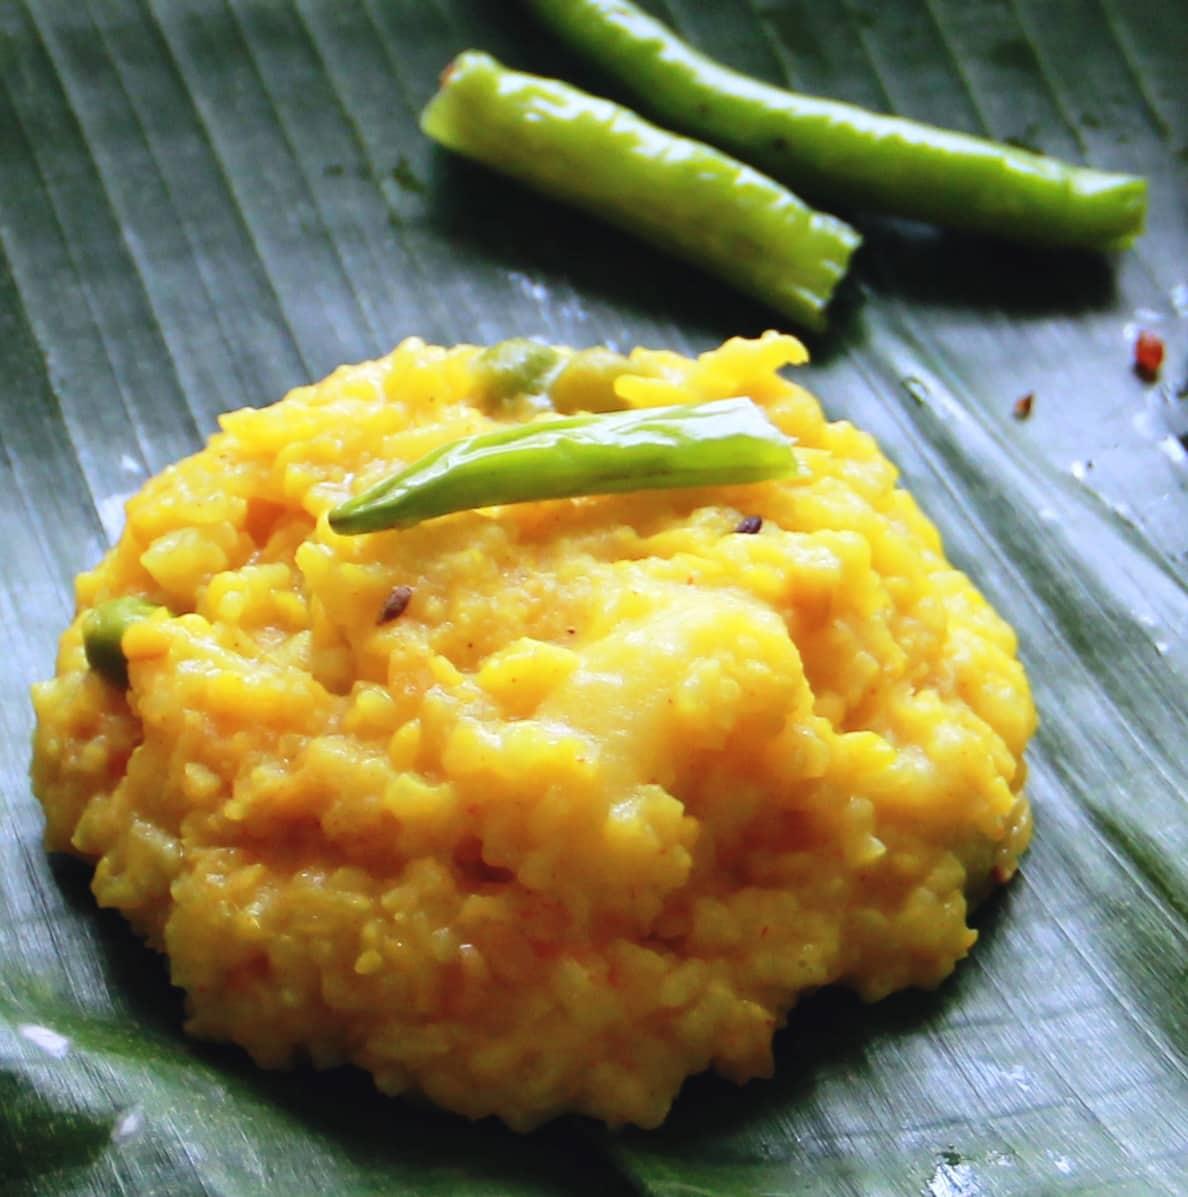 Khichuri, a bengali dish , #fromthecornertable, from the corner table, fromthecornertable, food blog, travel tuck-in talk, recipe, khichdi, bengali food, comfort food, healthy food, homemade, indian food, indian recipes; Photo: Vaibhav Tanna